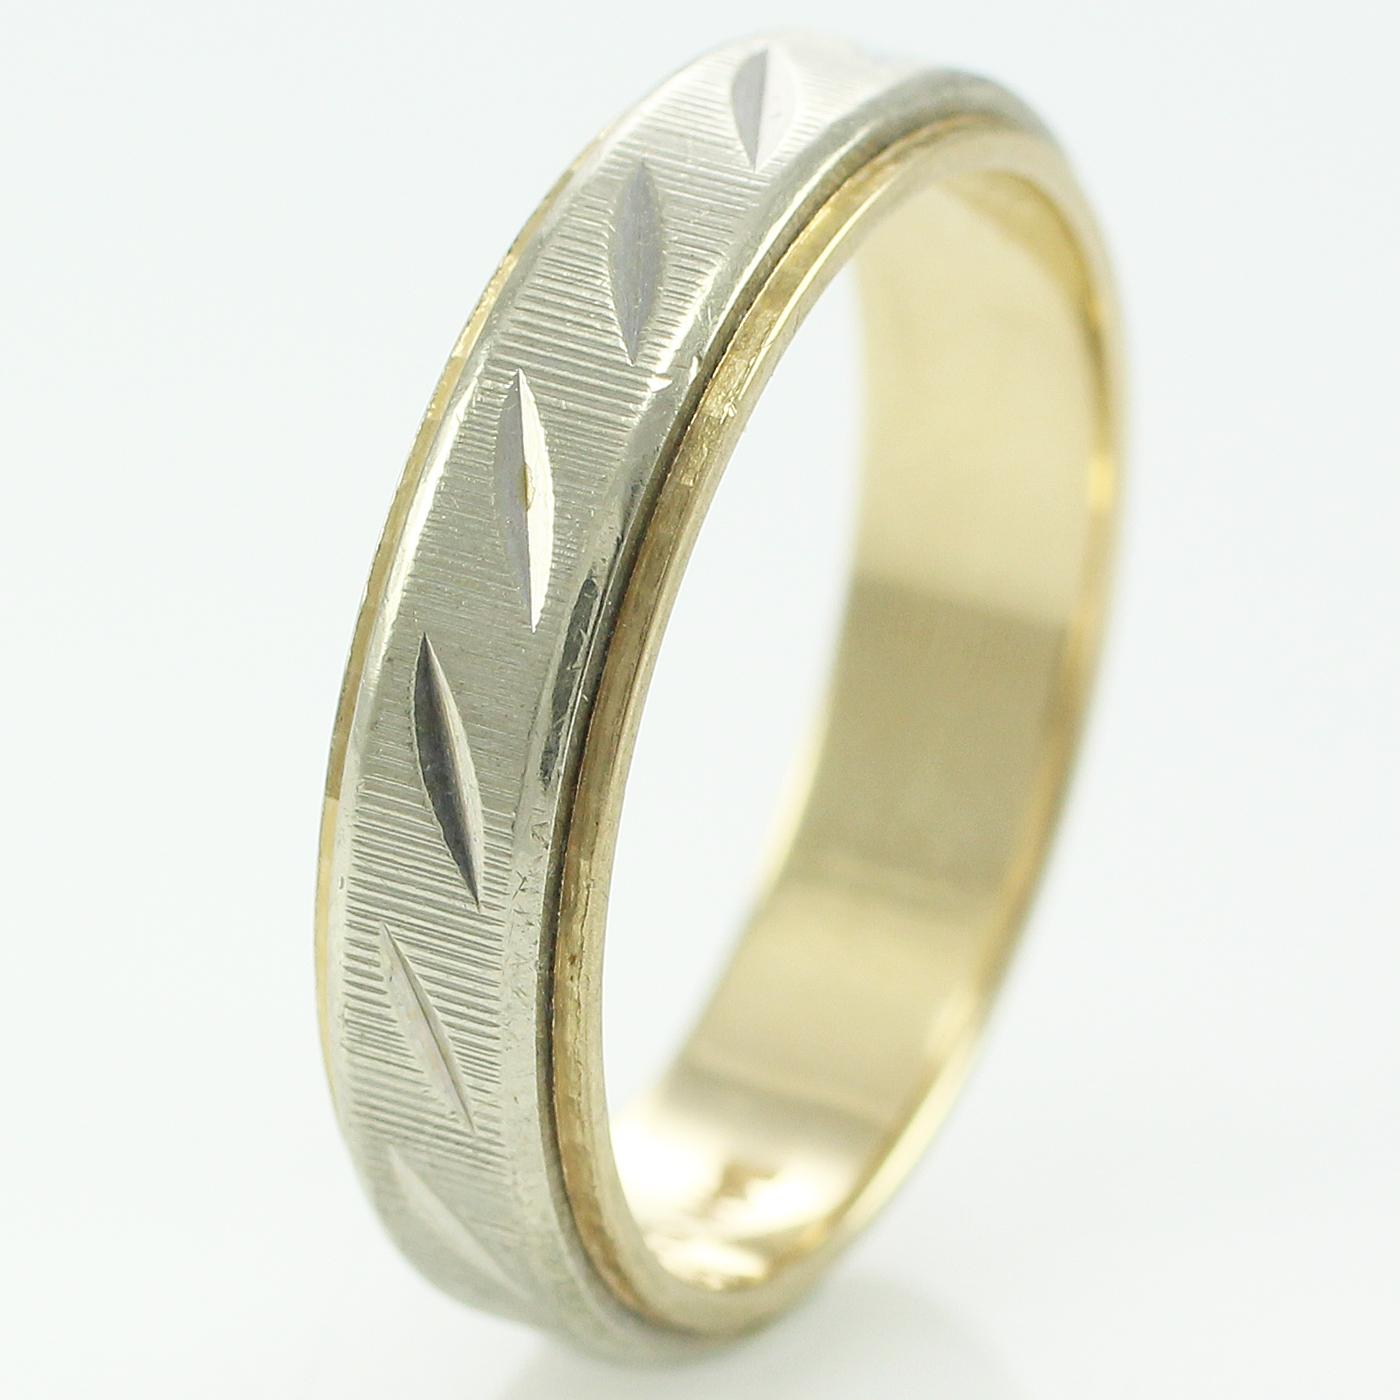 VINTAGE 14K Yellow White GOLD DiamondCut Wedding BAND RING Size 9